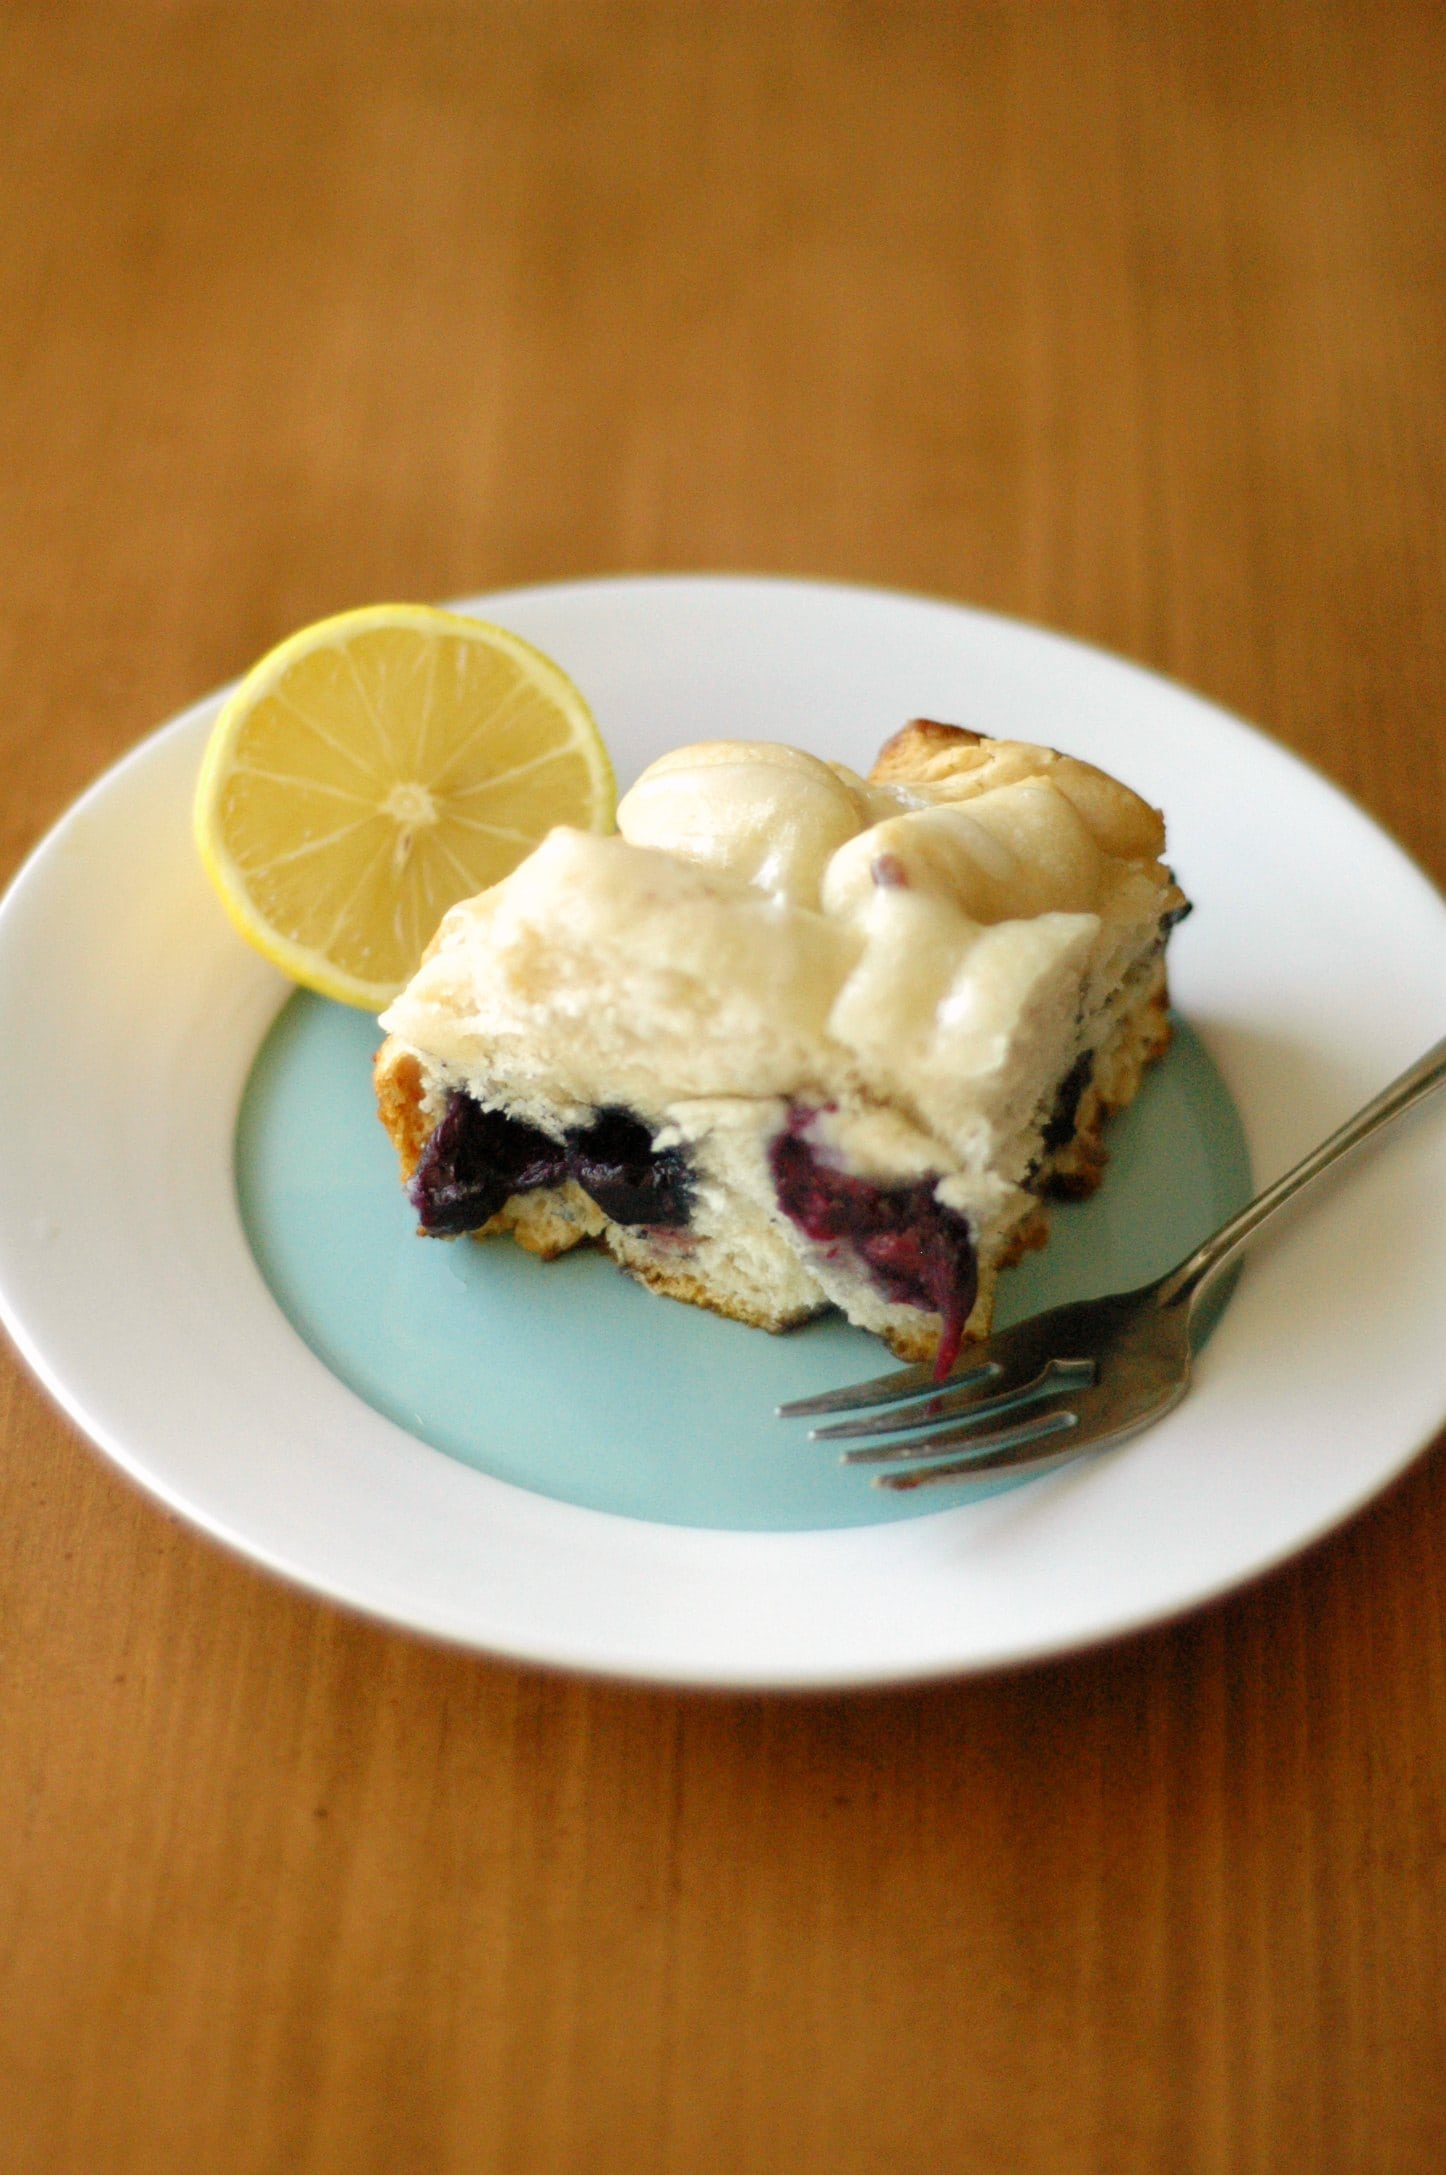 Slow Cooker Blueberry Breakfast Cake